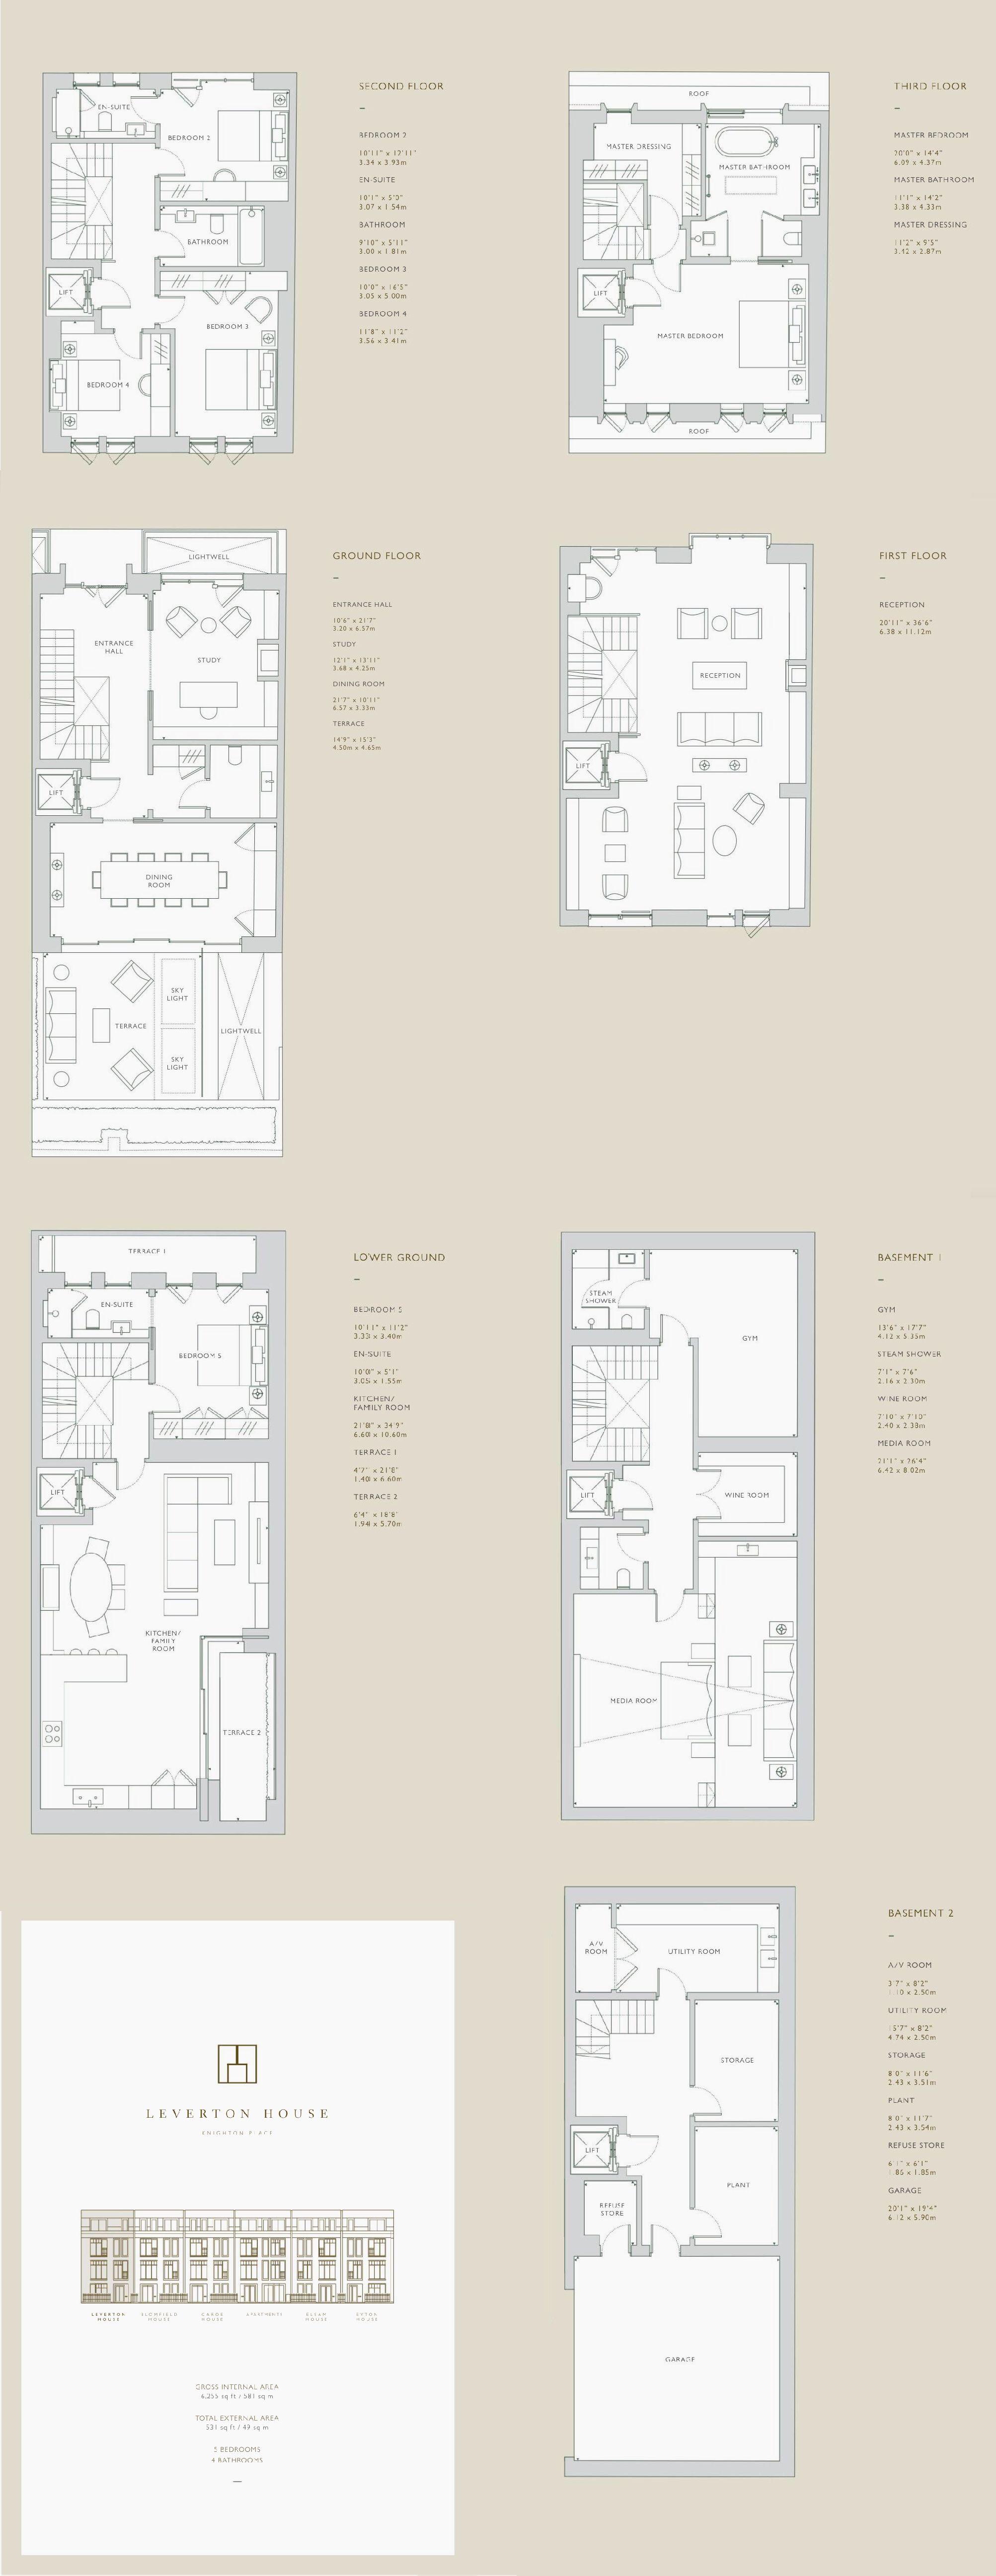 Leverton House Knighton Place Town House Floor Plan House Floor Plans Floor Plans